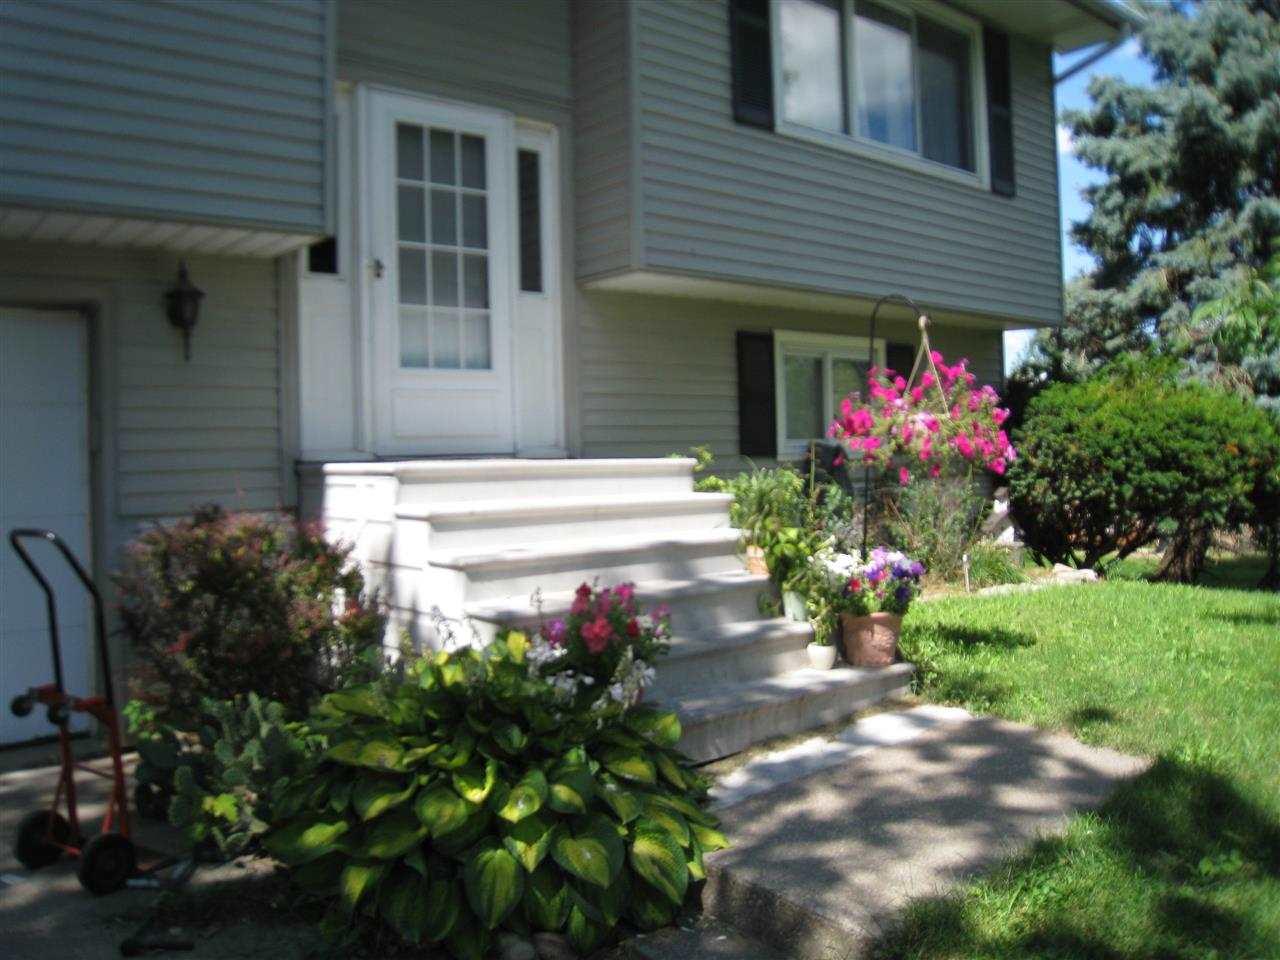 Real Estate for Sale, ListingId: 28999604, Orion,IL61273